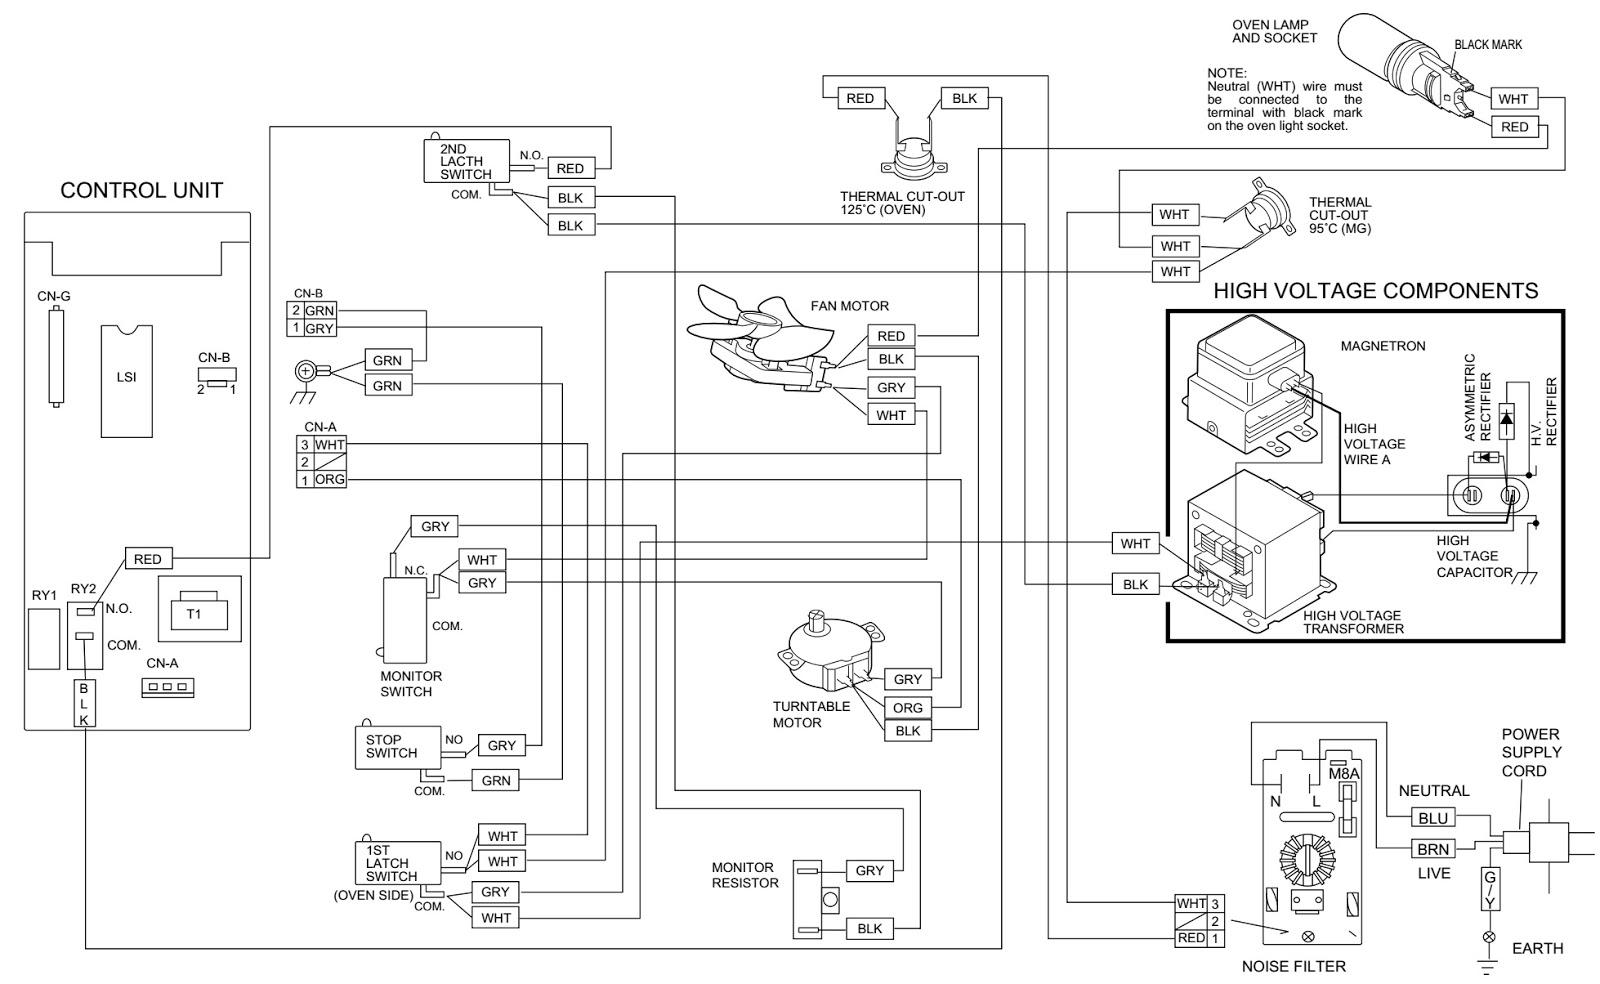 ge refrigerator wiring diagram 1967 18 20 tridonicsignage de u2022ge refrigerator wiring diagram 1967 best [ 1600 x 984 Pixel ]